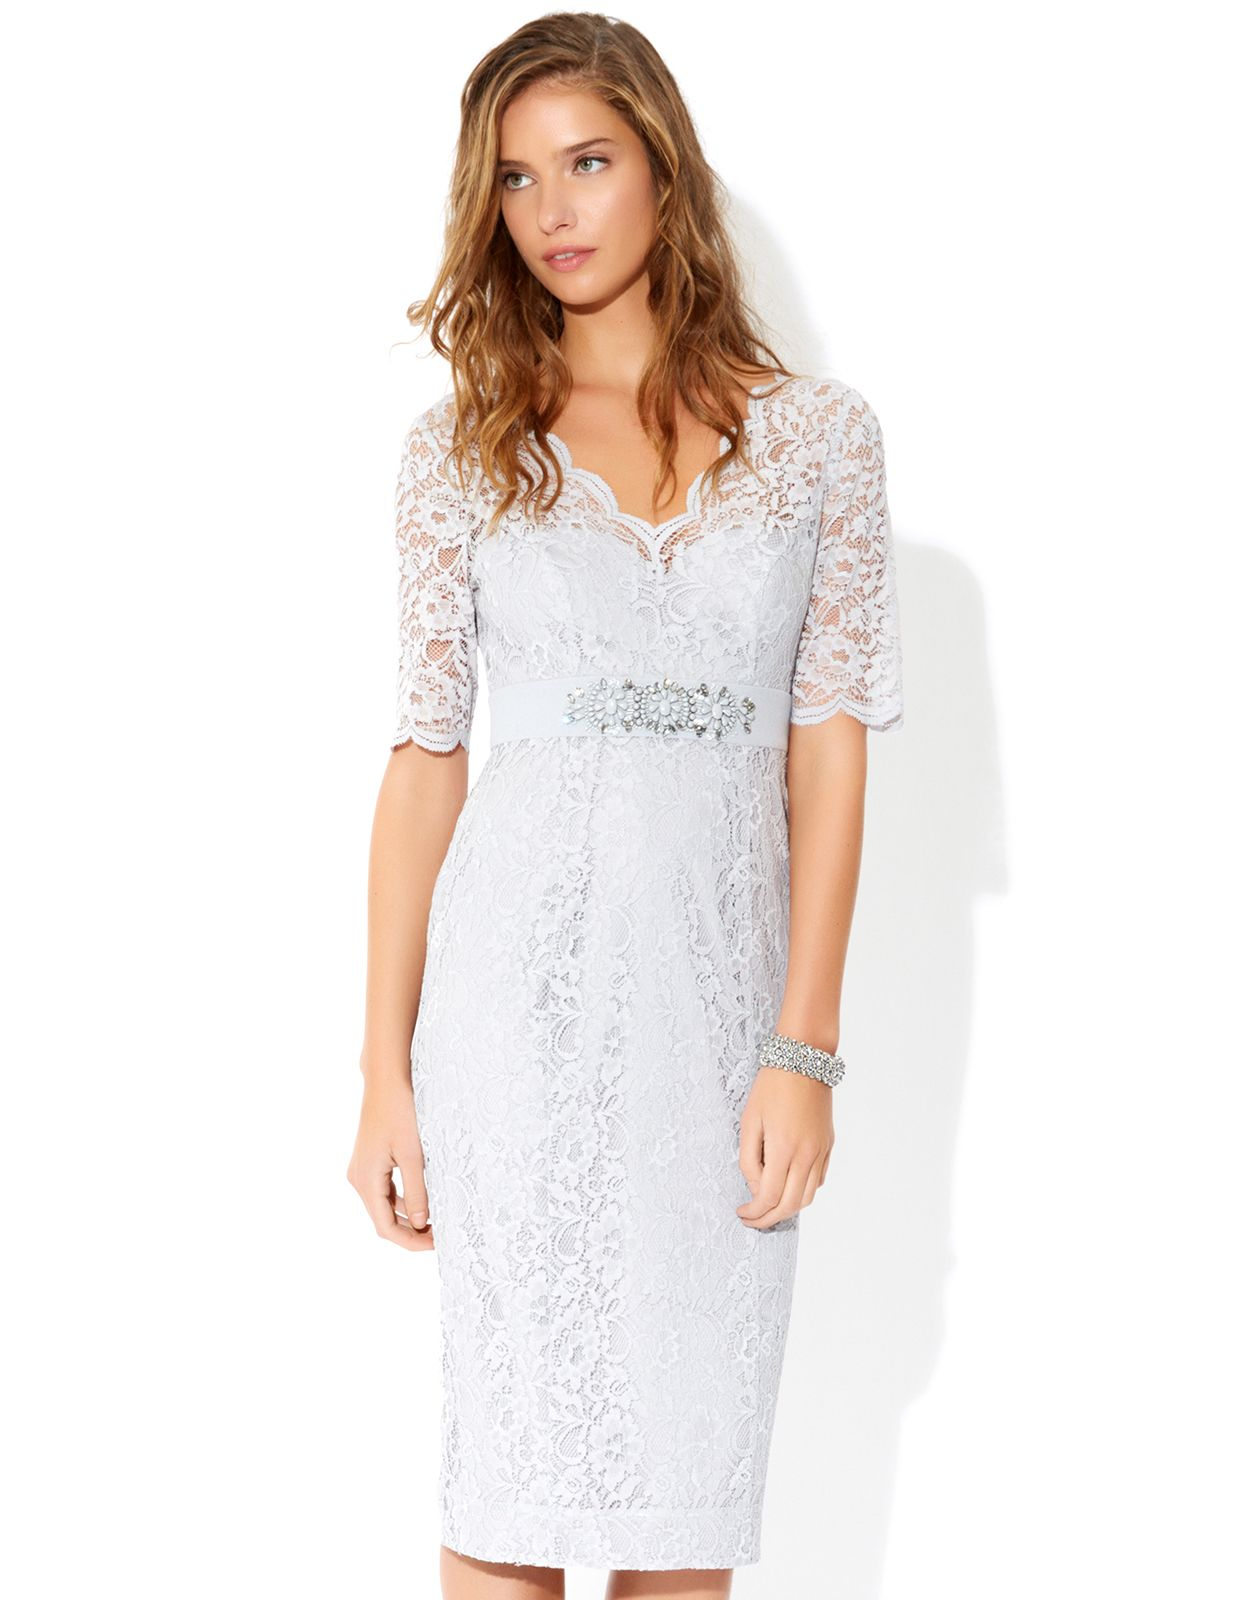 e3207fec3c Modest Church Dresses Uk